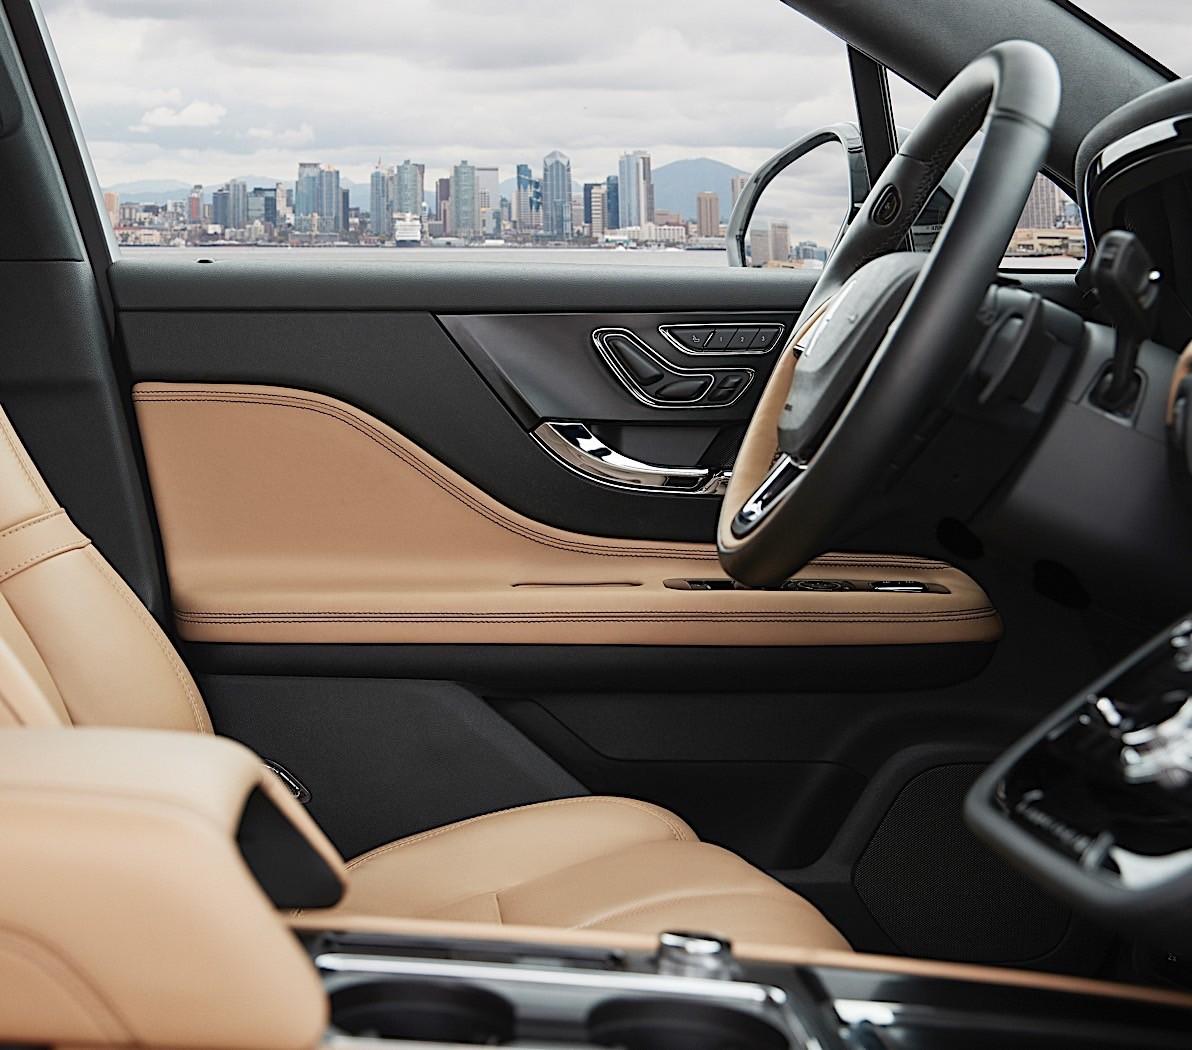 2020 Lincoln Corsair Hits Small Luxury SUV Segment With